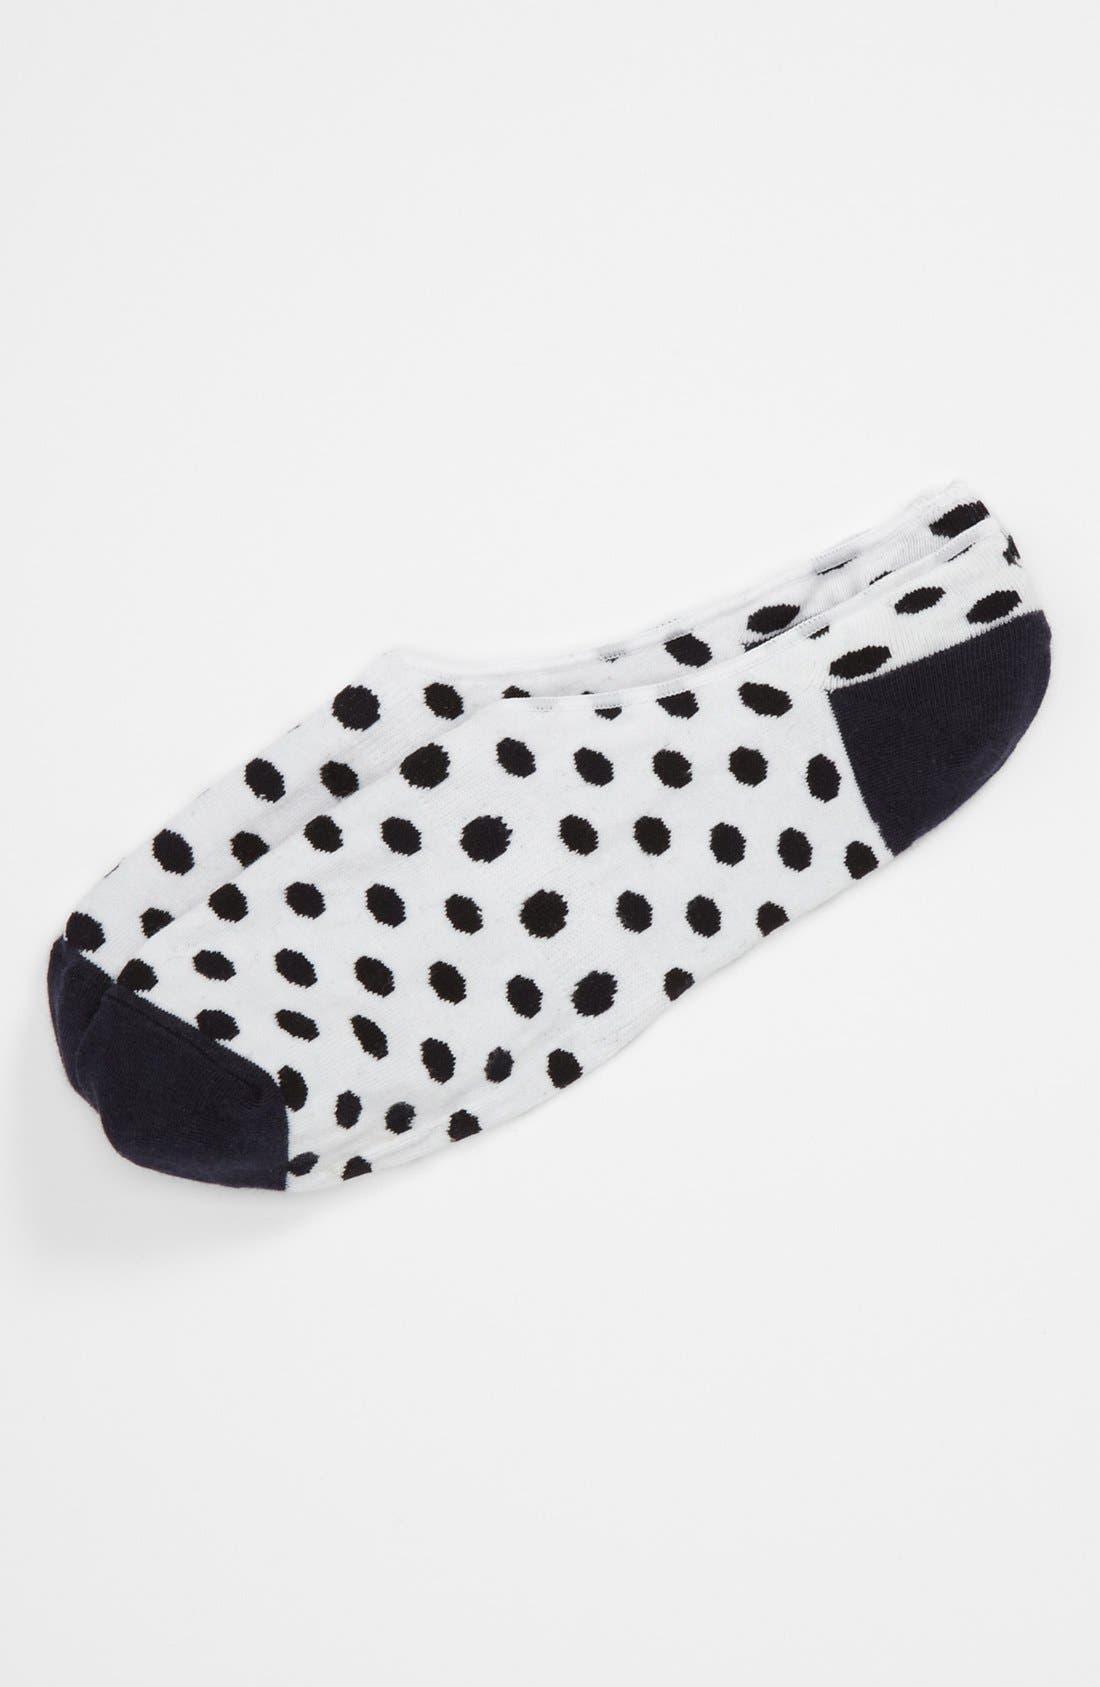 LORENZO UOMO, Dot No-Show Socks, Main thumbnail 1, color, 100